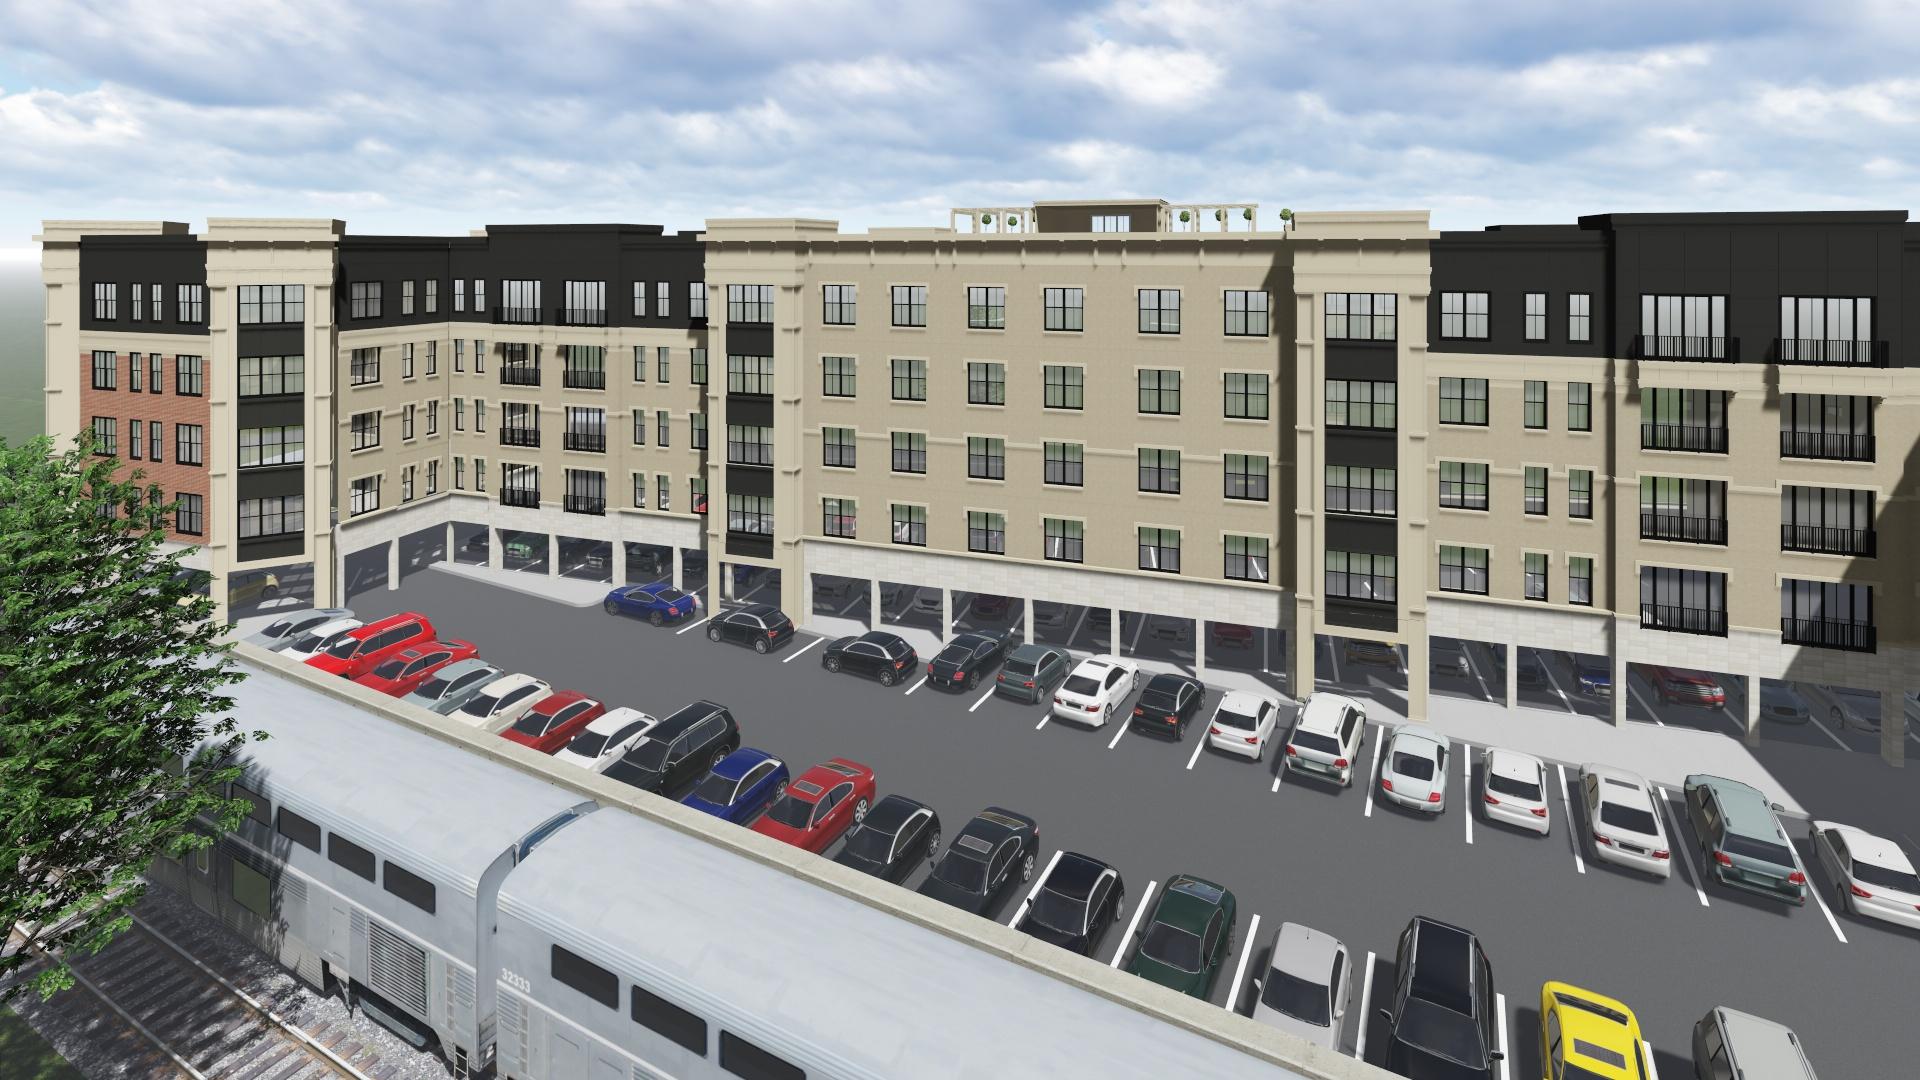 2015.12.01_Oak Street Apartments_V09.jpg